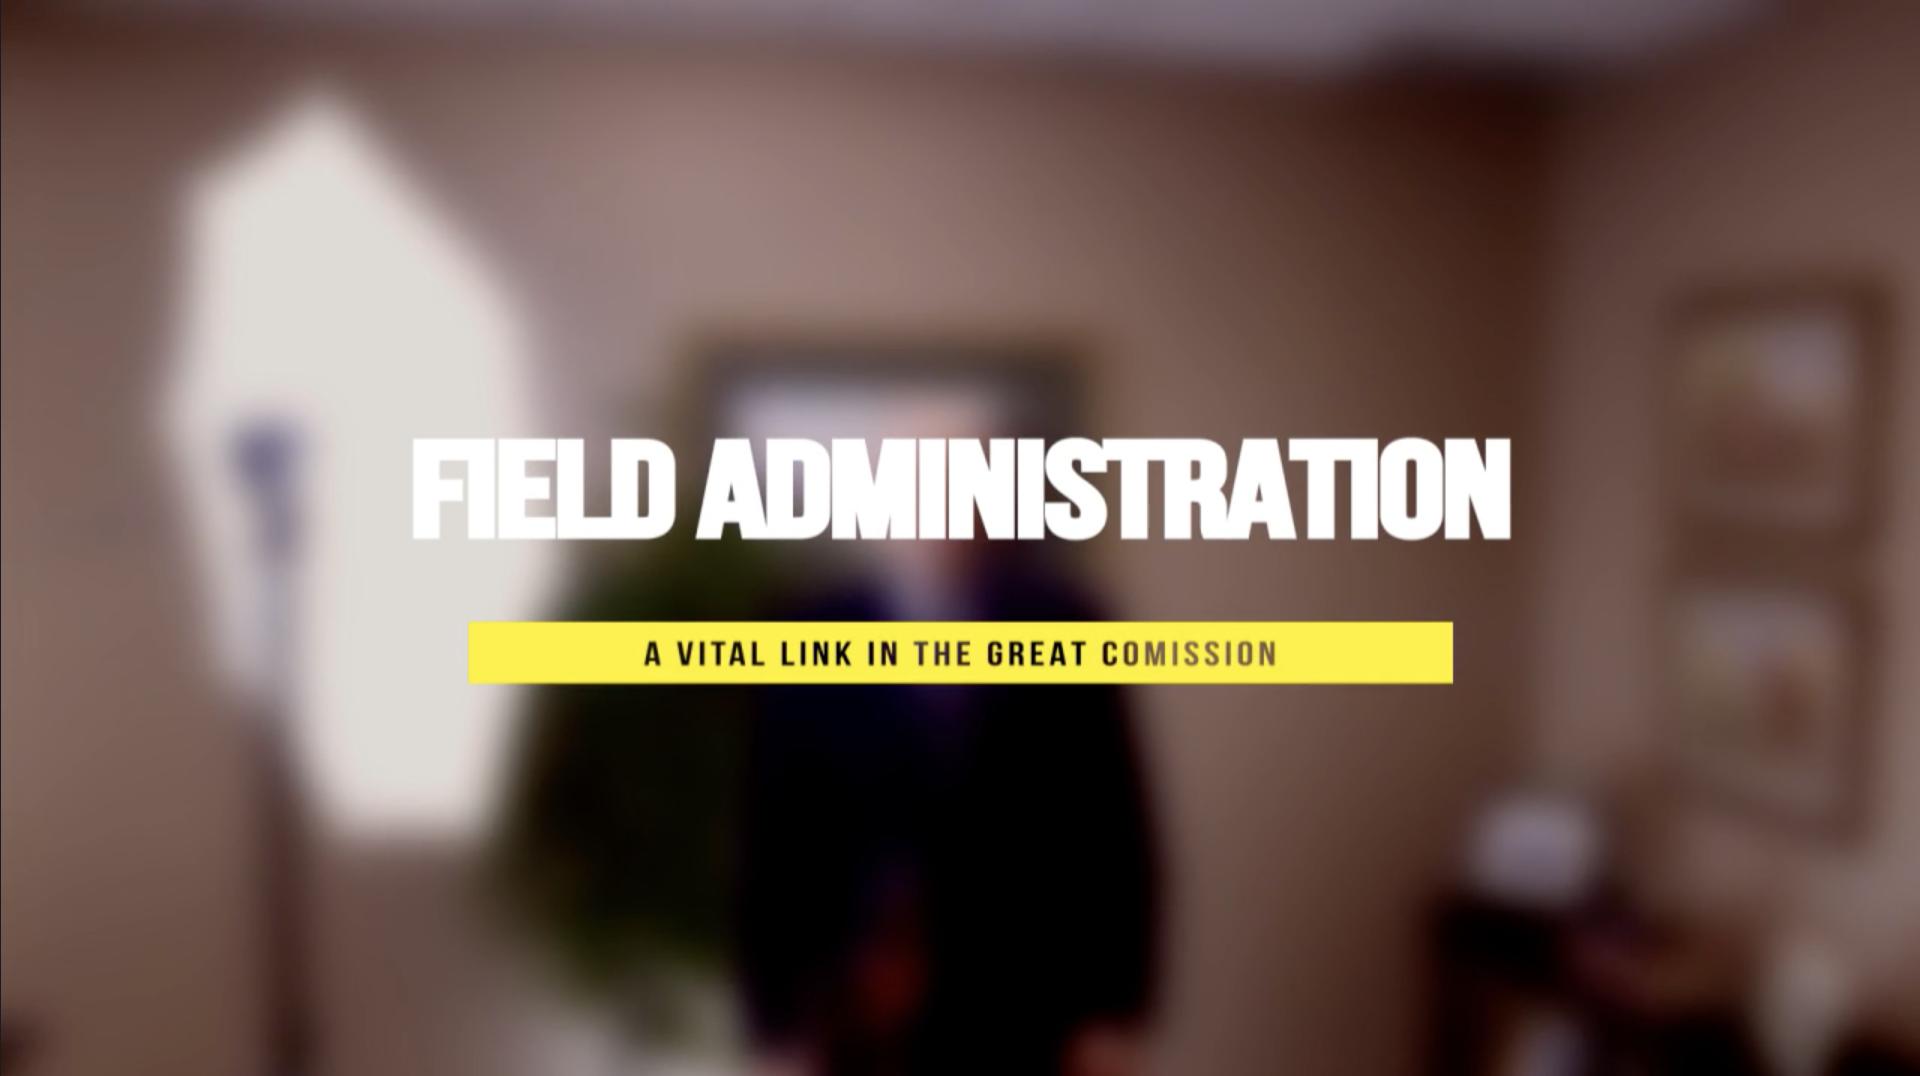 Field Administration Film